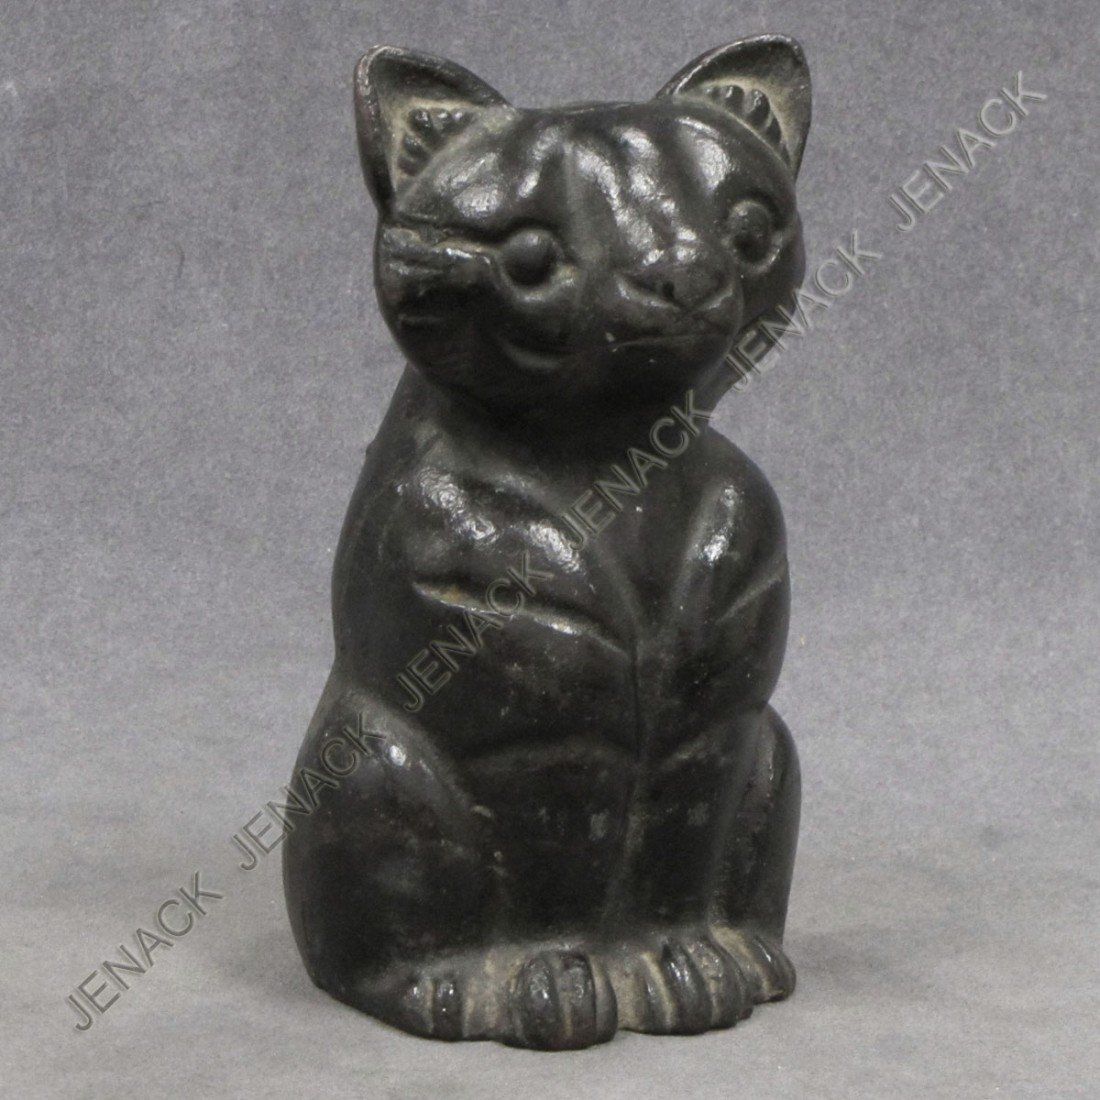 52: VINTAGE CAST IRON DOORSTOP, BLACK SITTING CAT